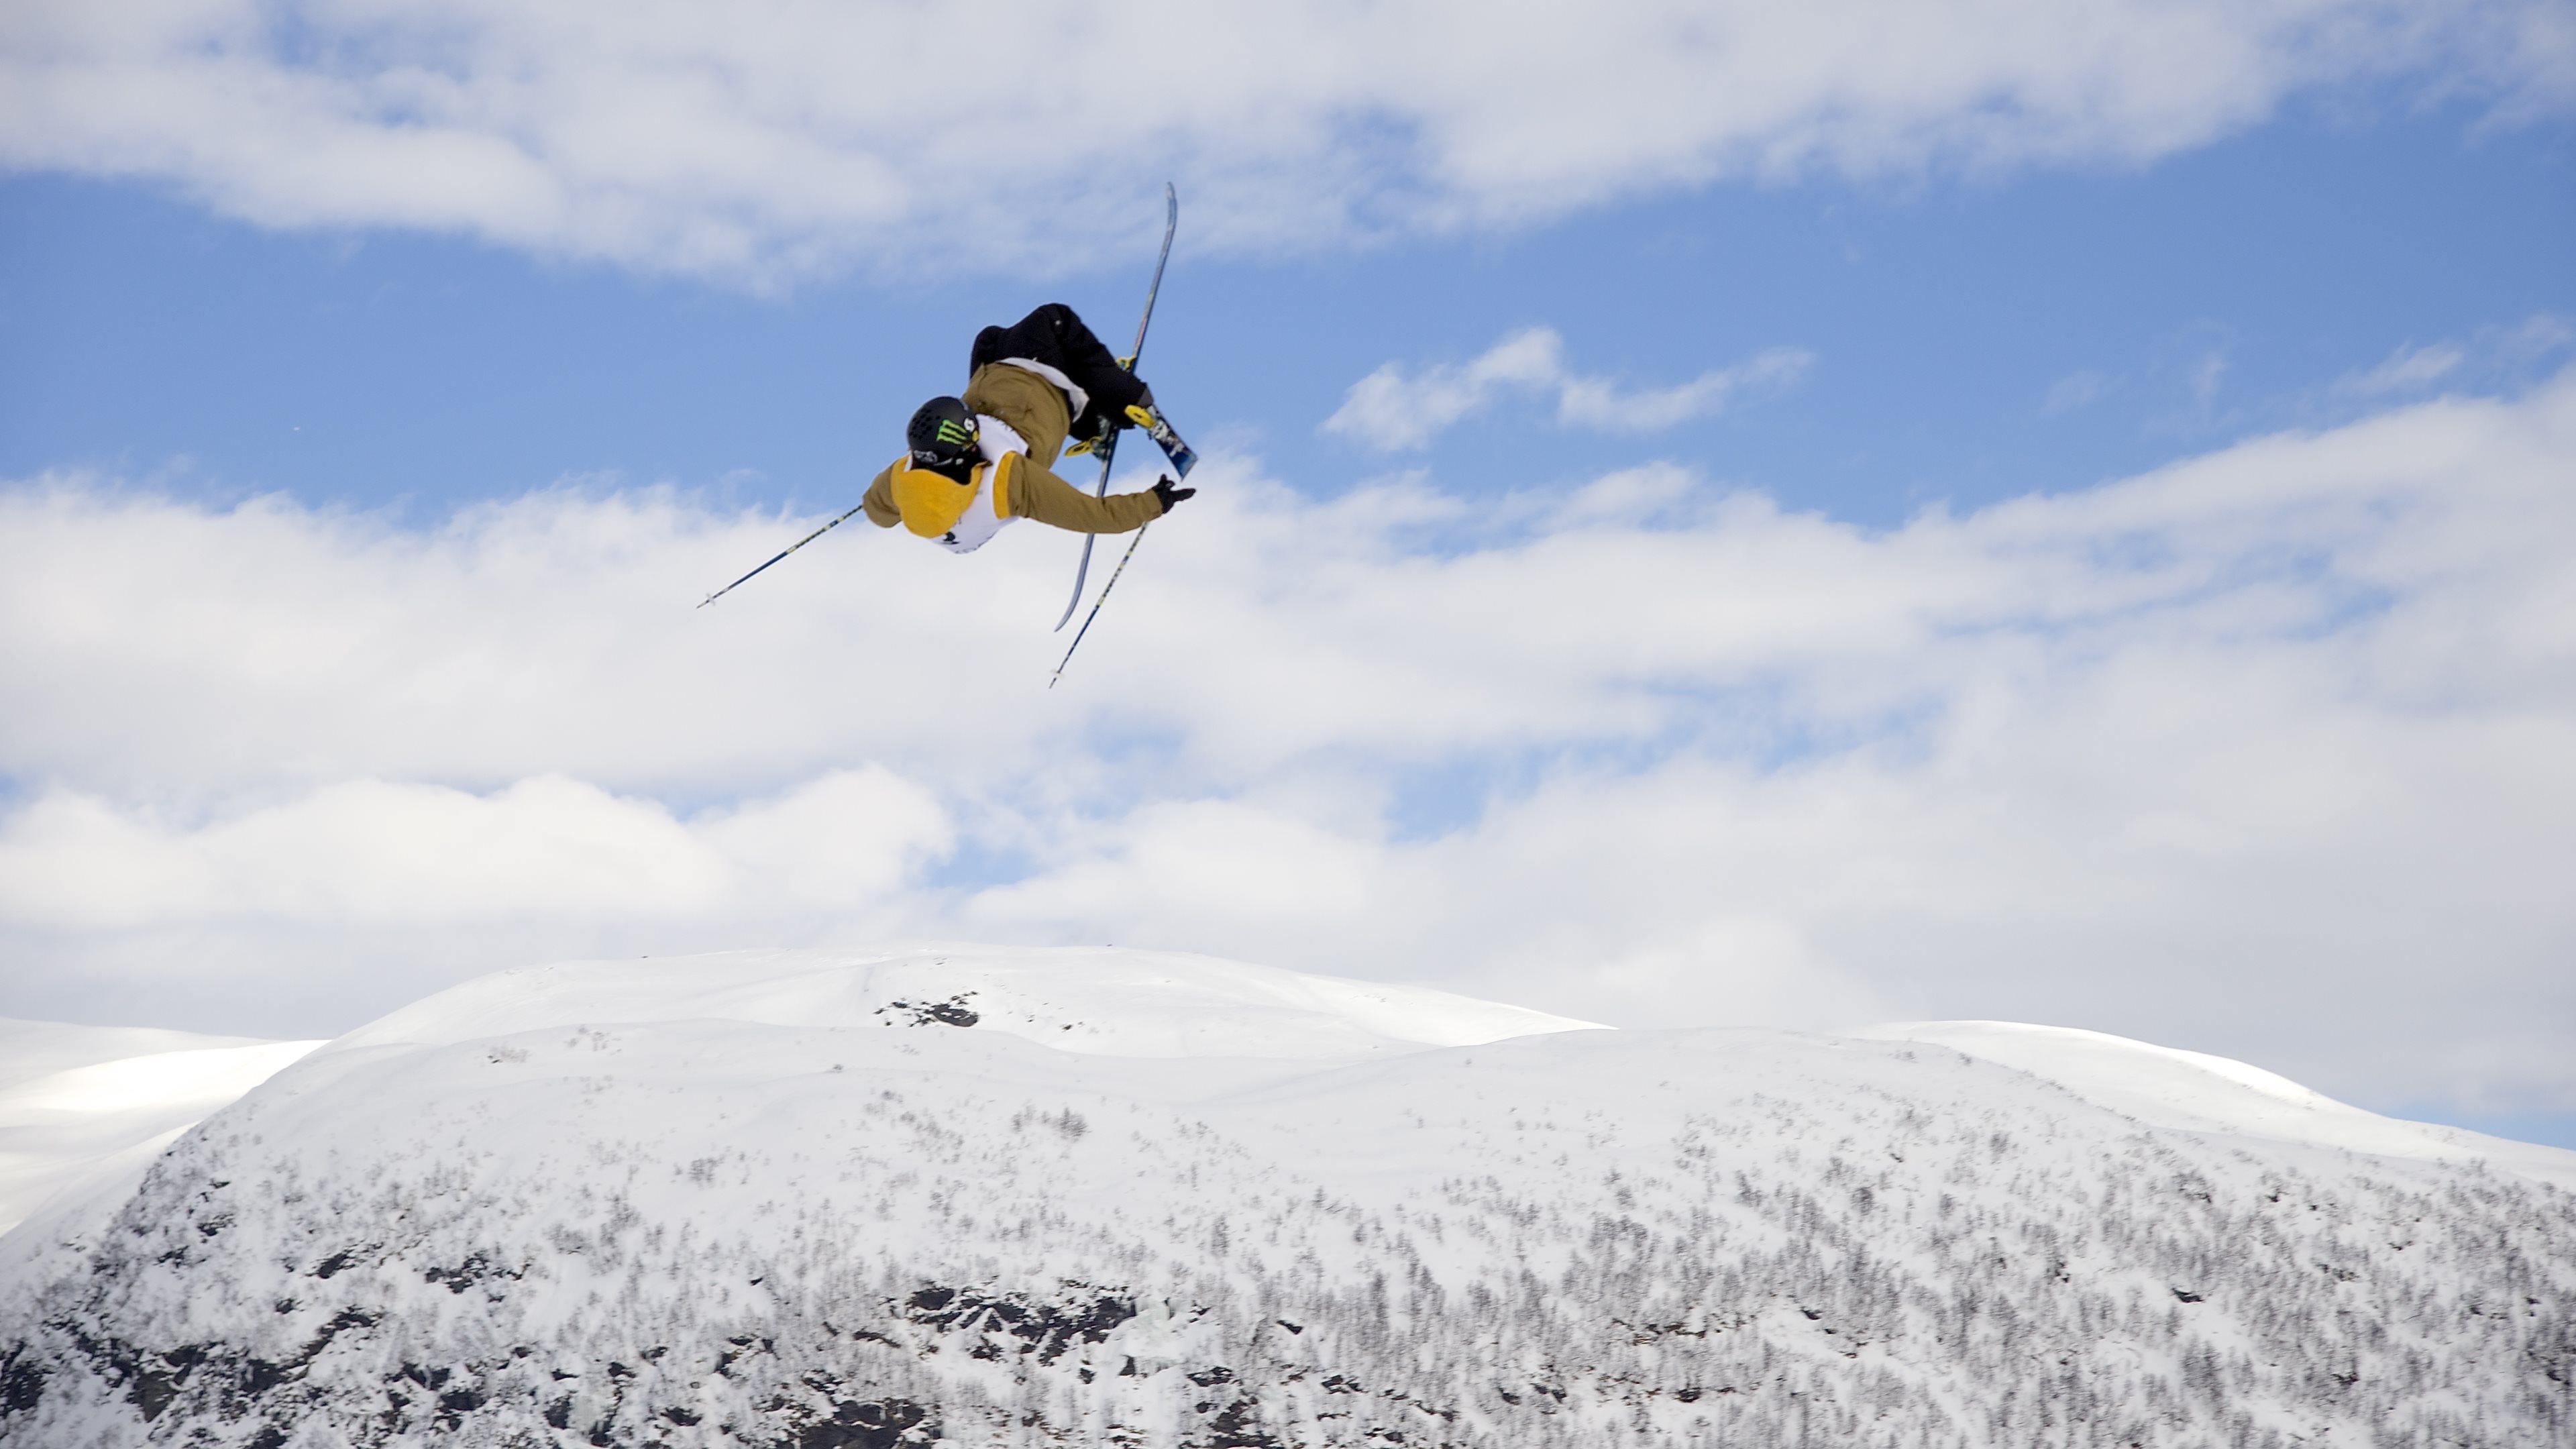 freestyle skiing wallpaper - photo #33